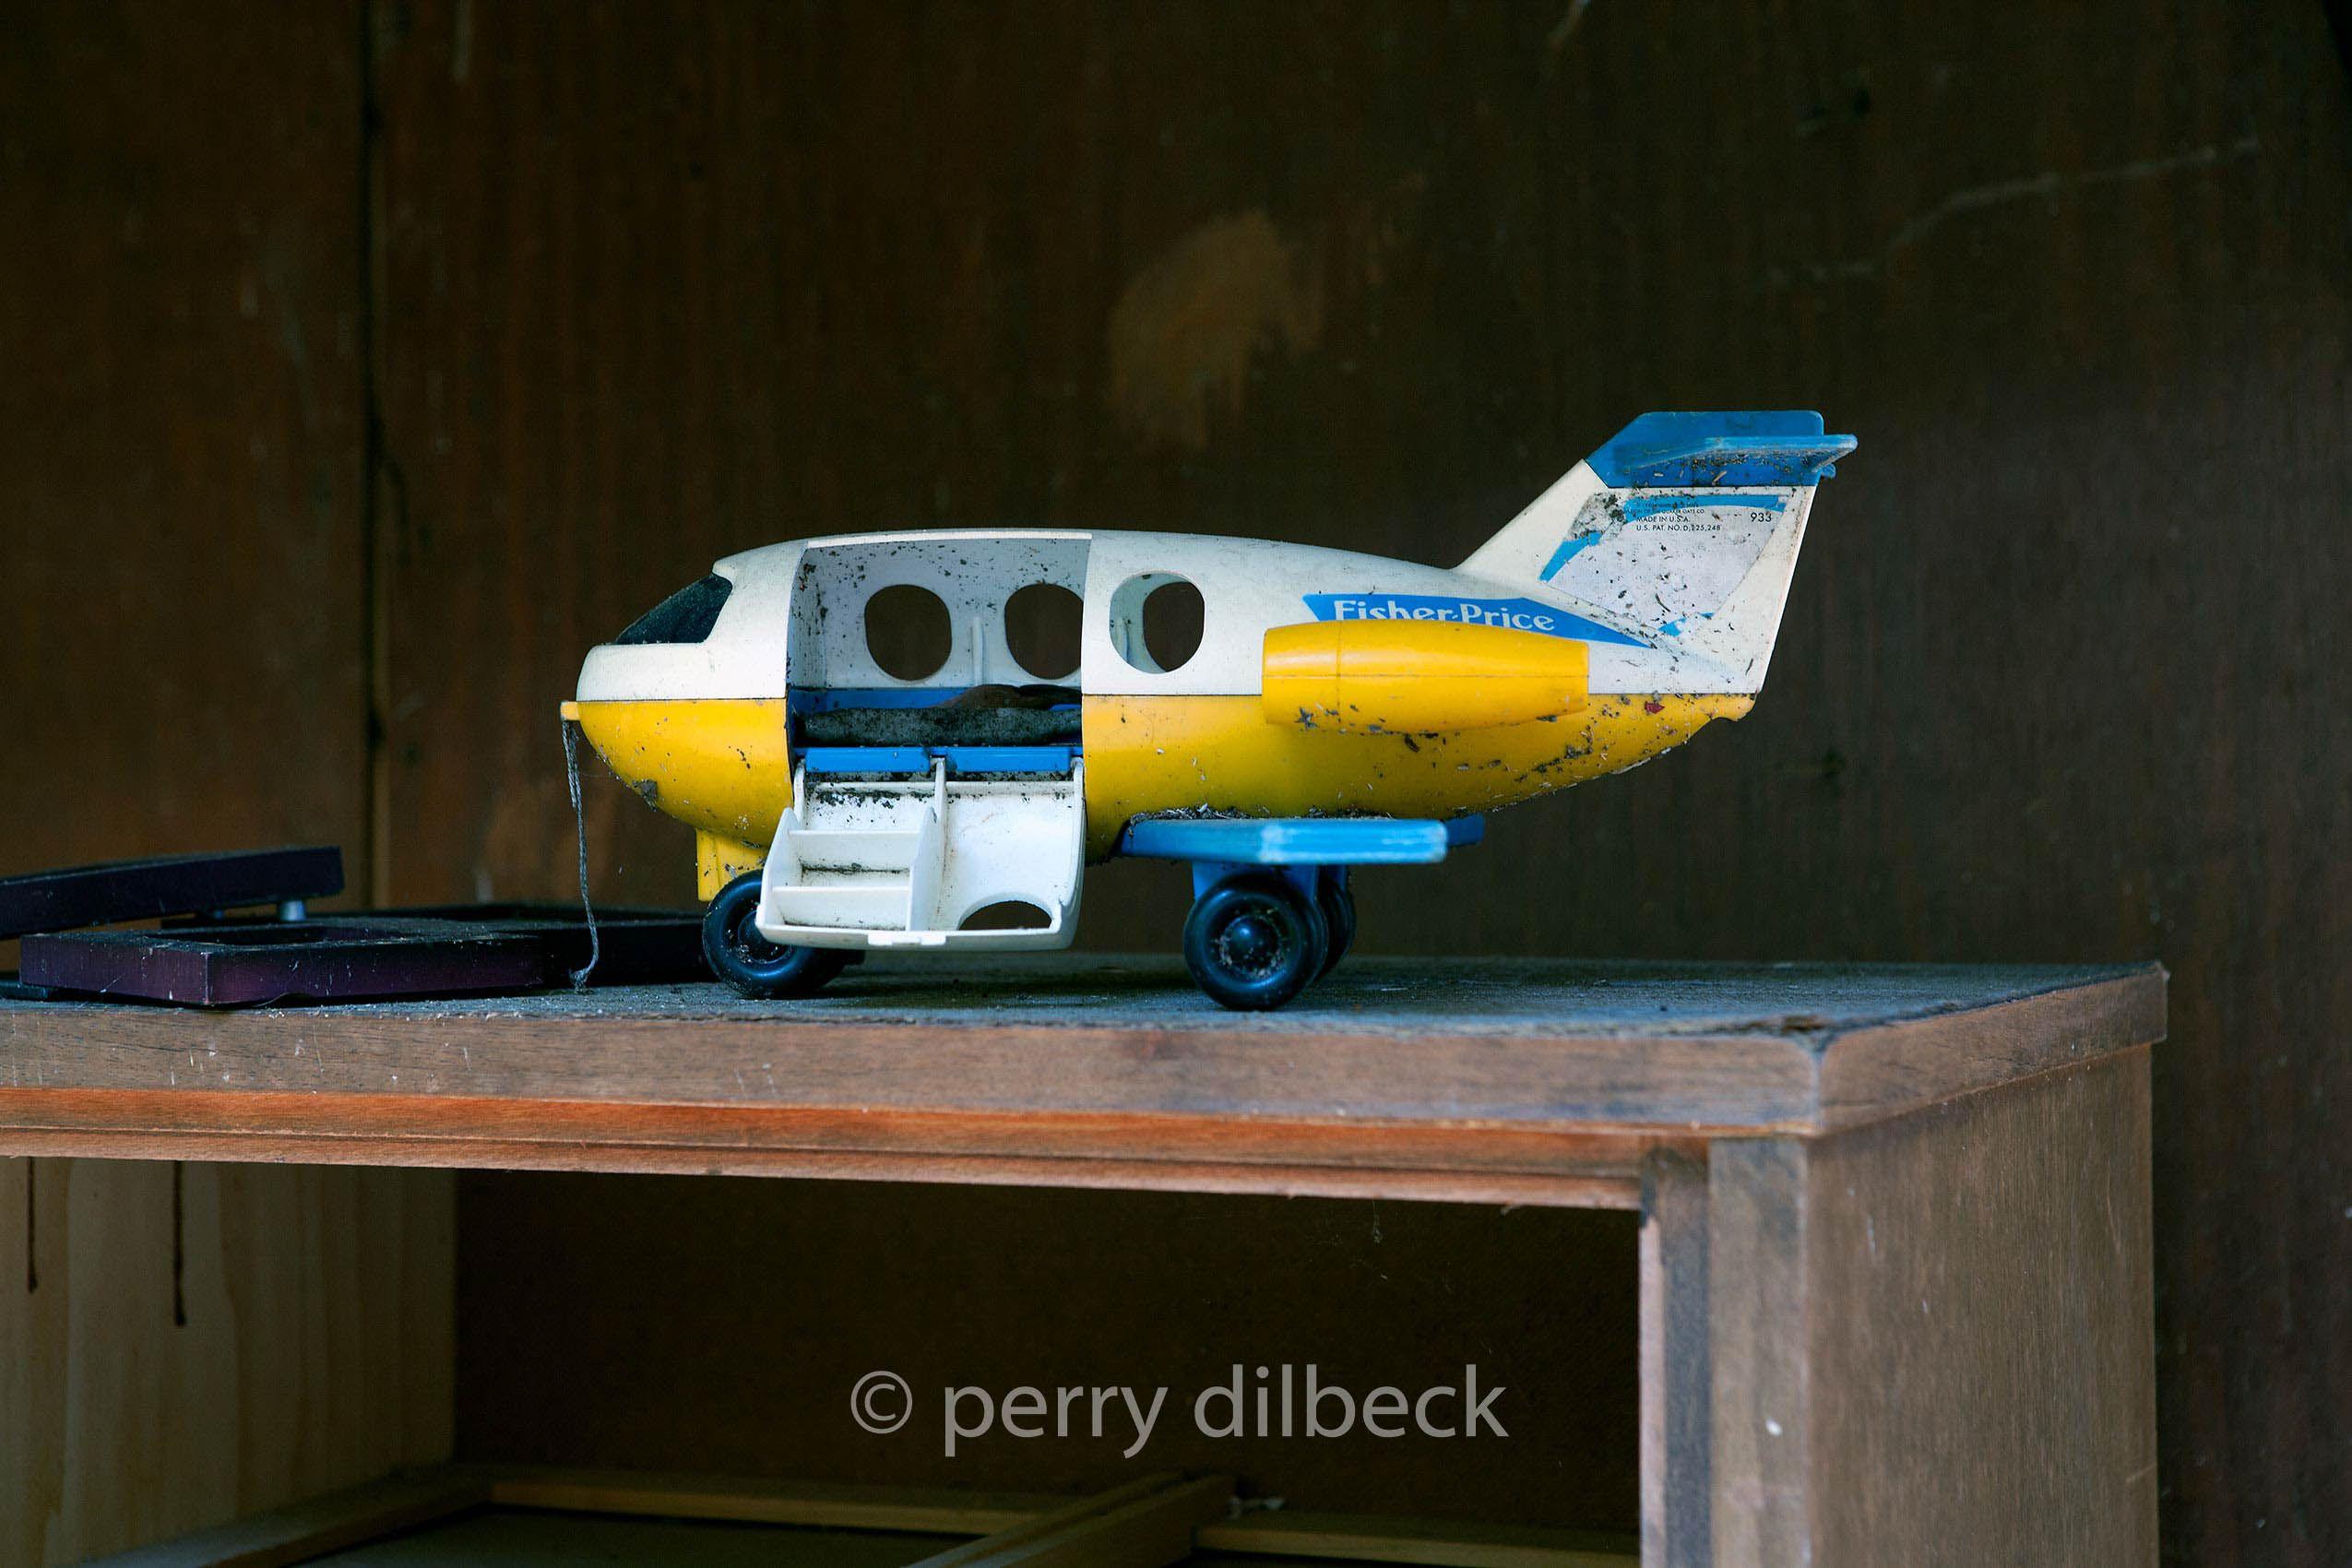 58planeCOLORCORRECT.jpg